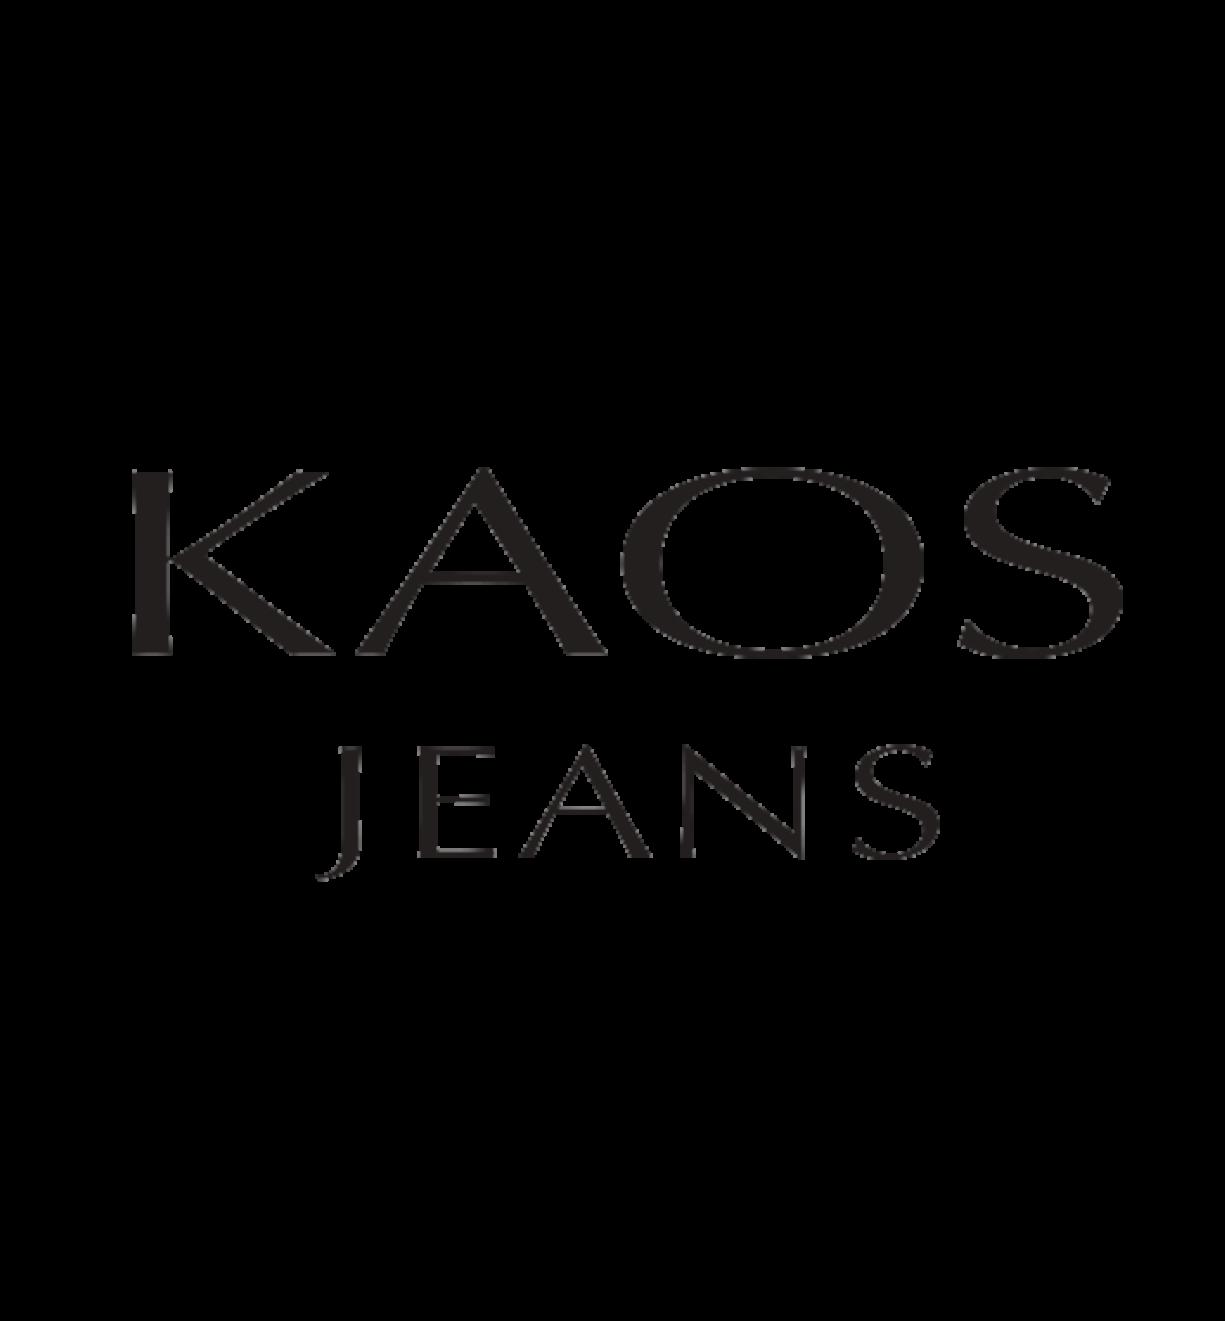 kaos-box